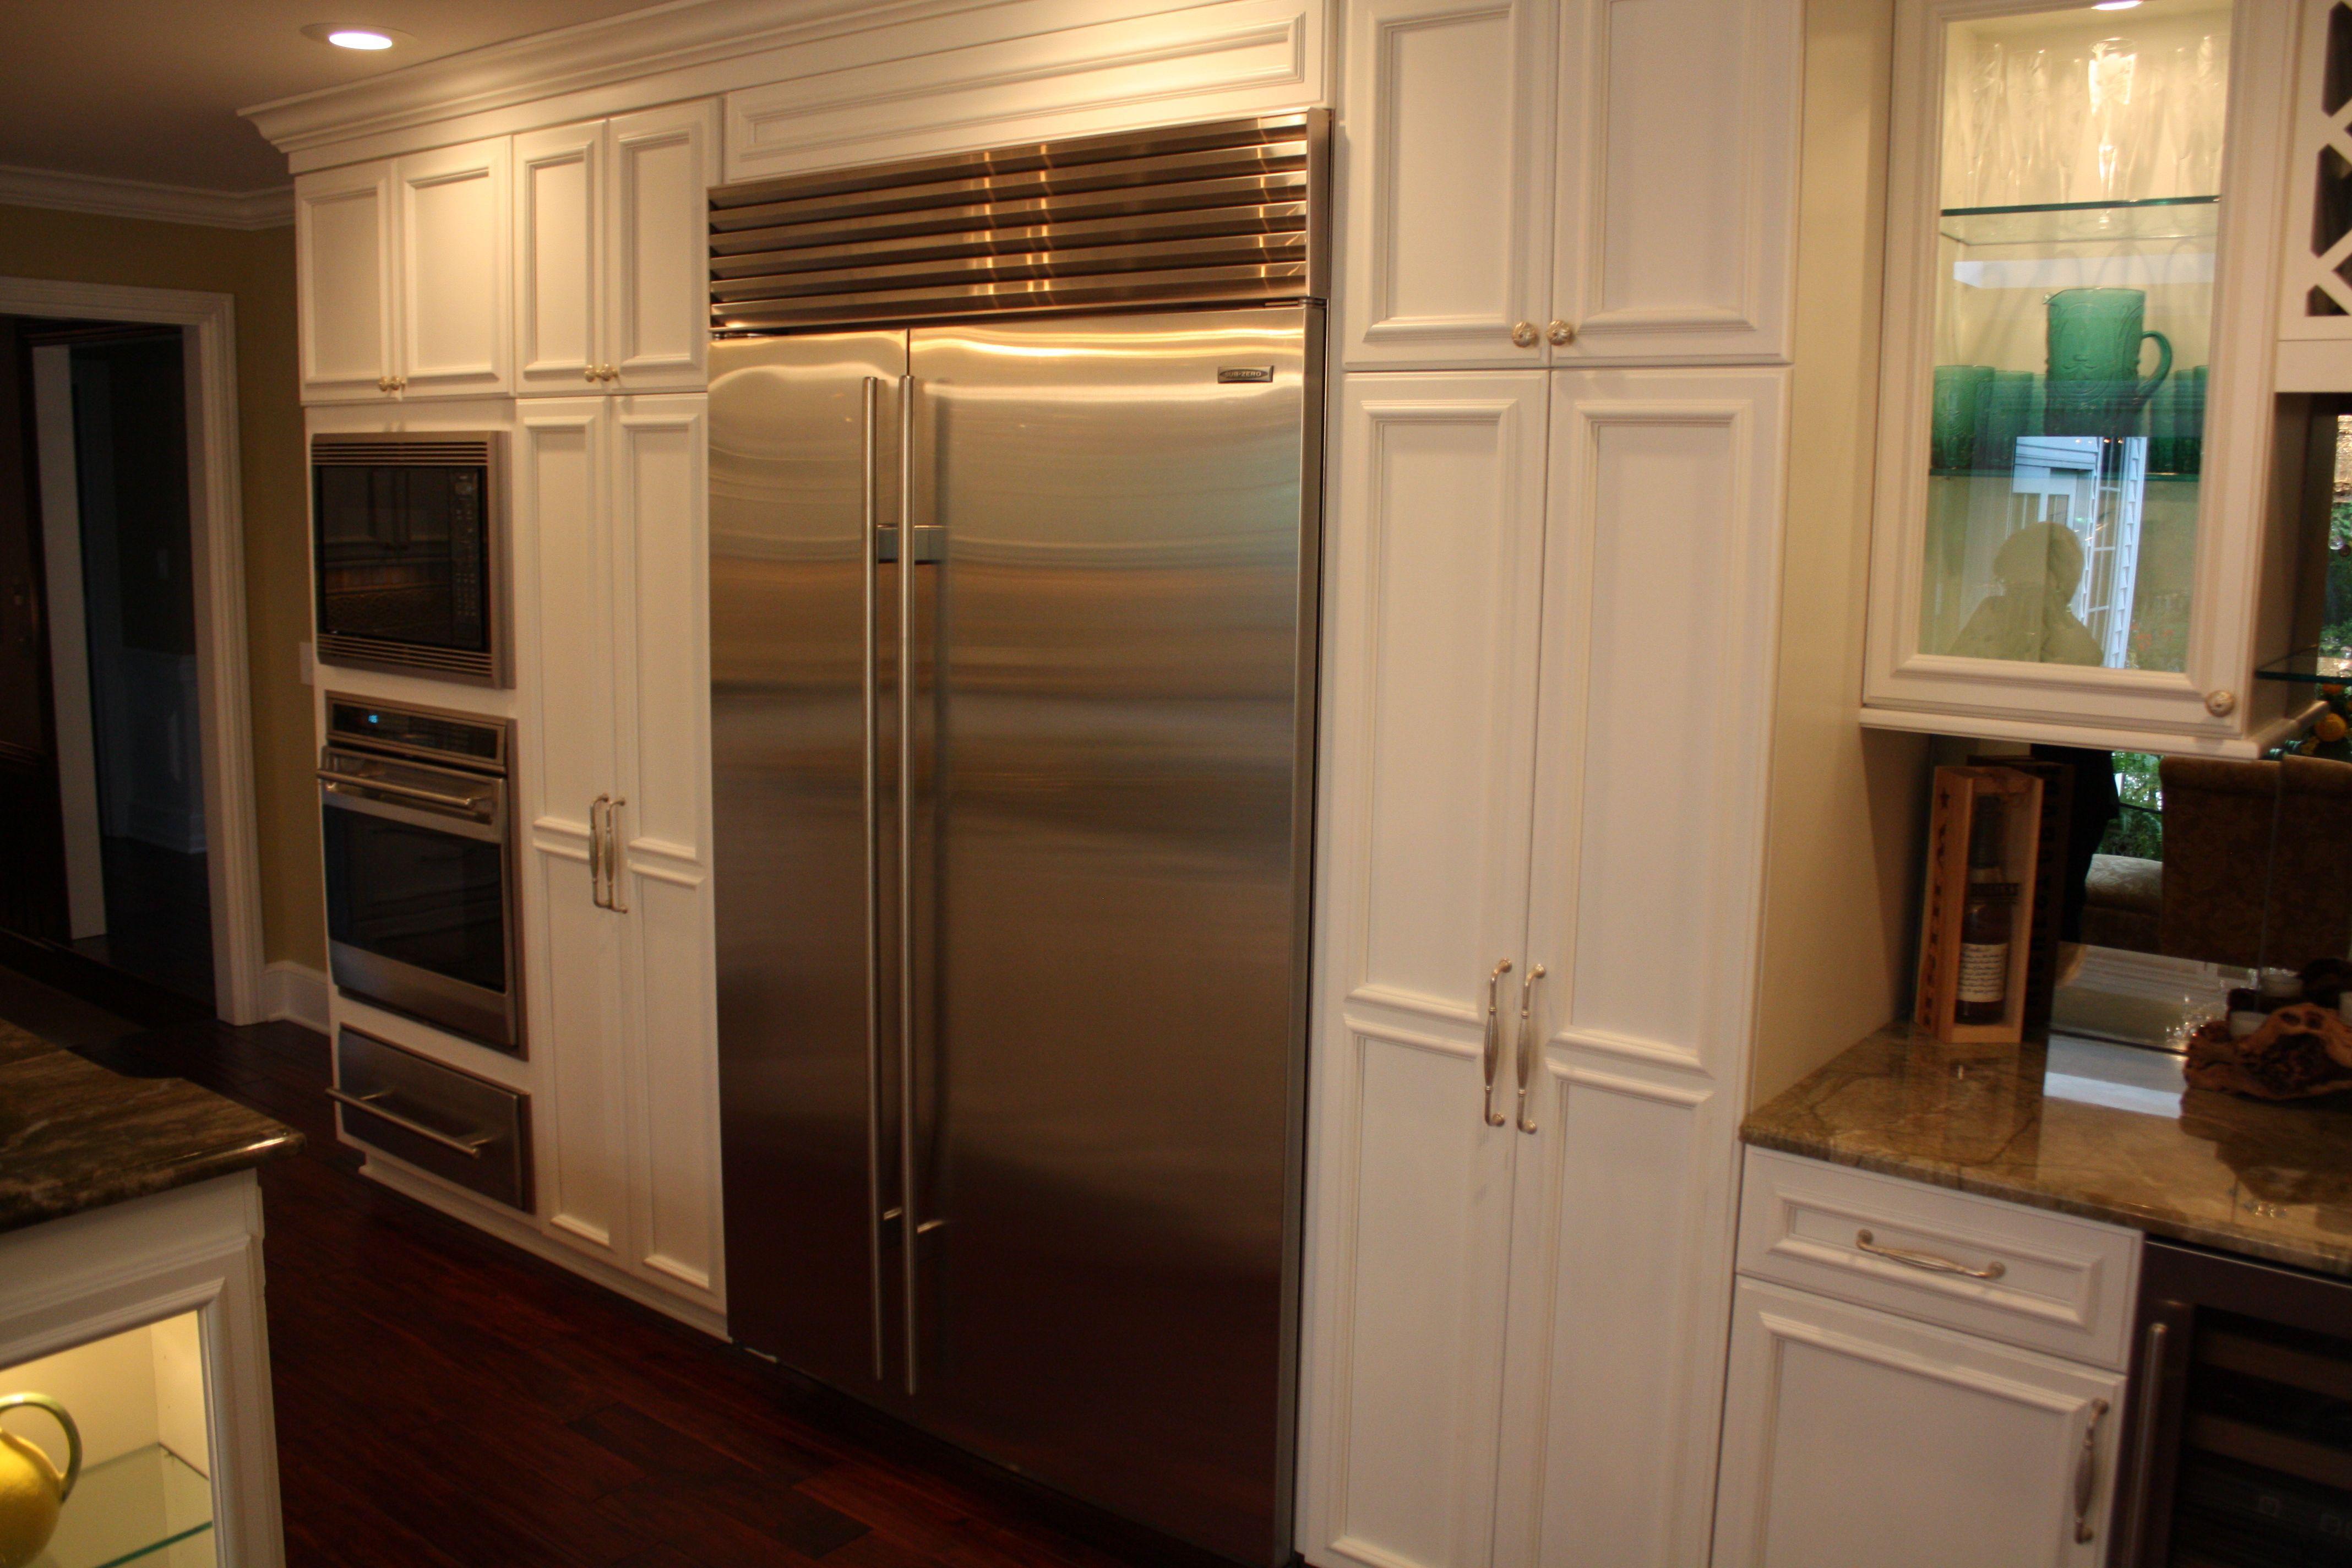 drawers zero series xamusa refrigerator product appliance freezer luxury sub